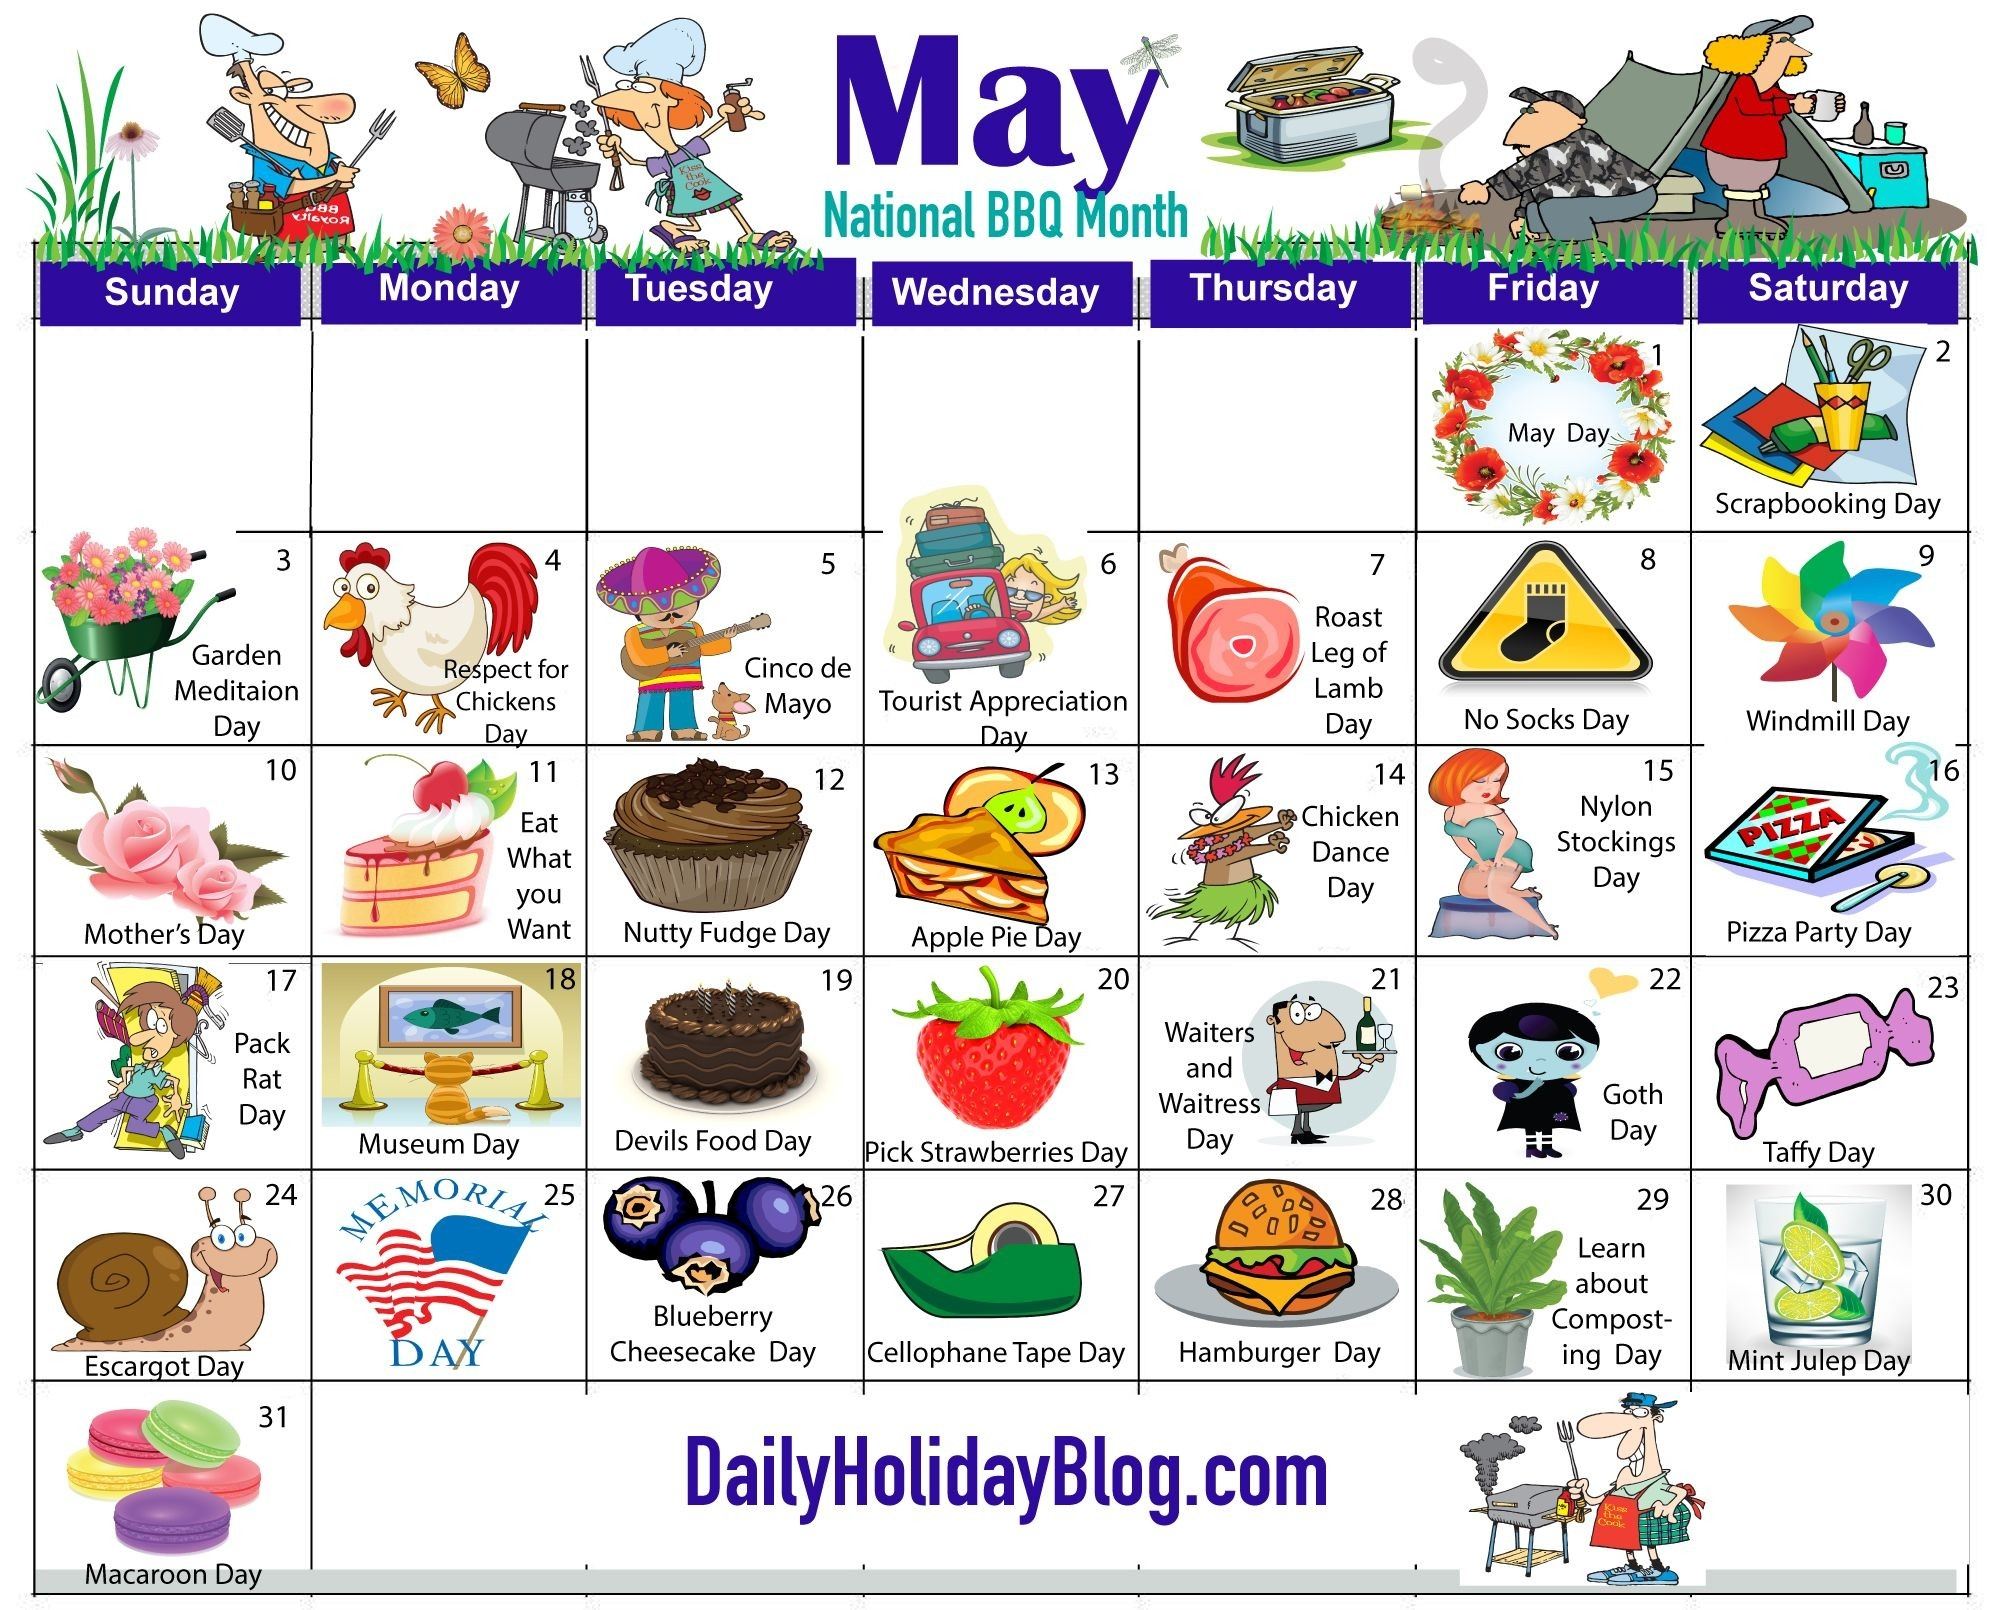 May Holiday Calendar … | Holidays In May, Wacky Holidays-September 2020 Daily Holidays Special And Wacky Days